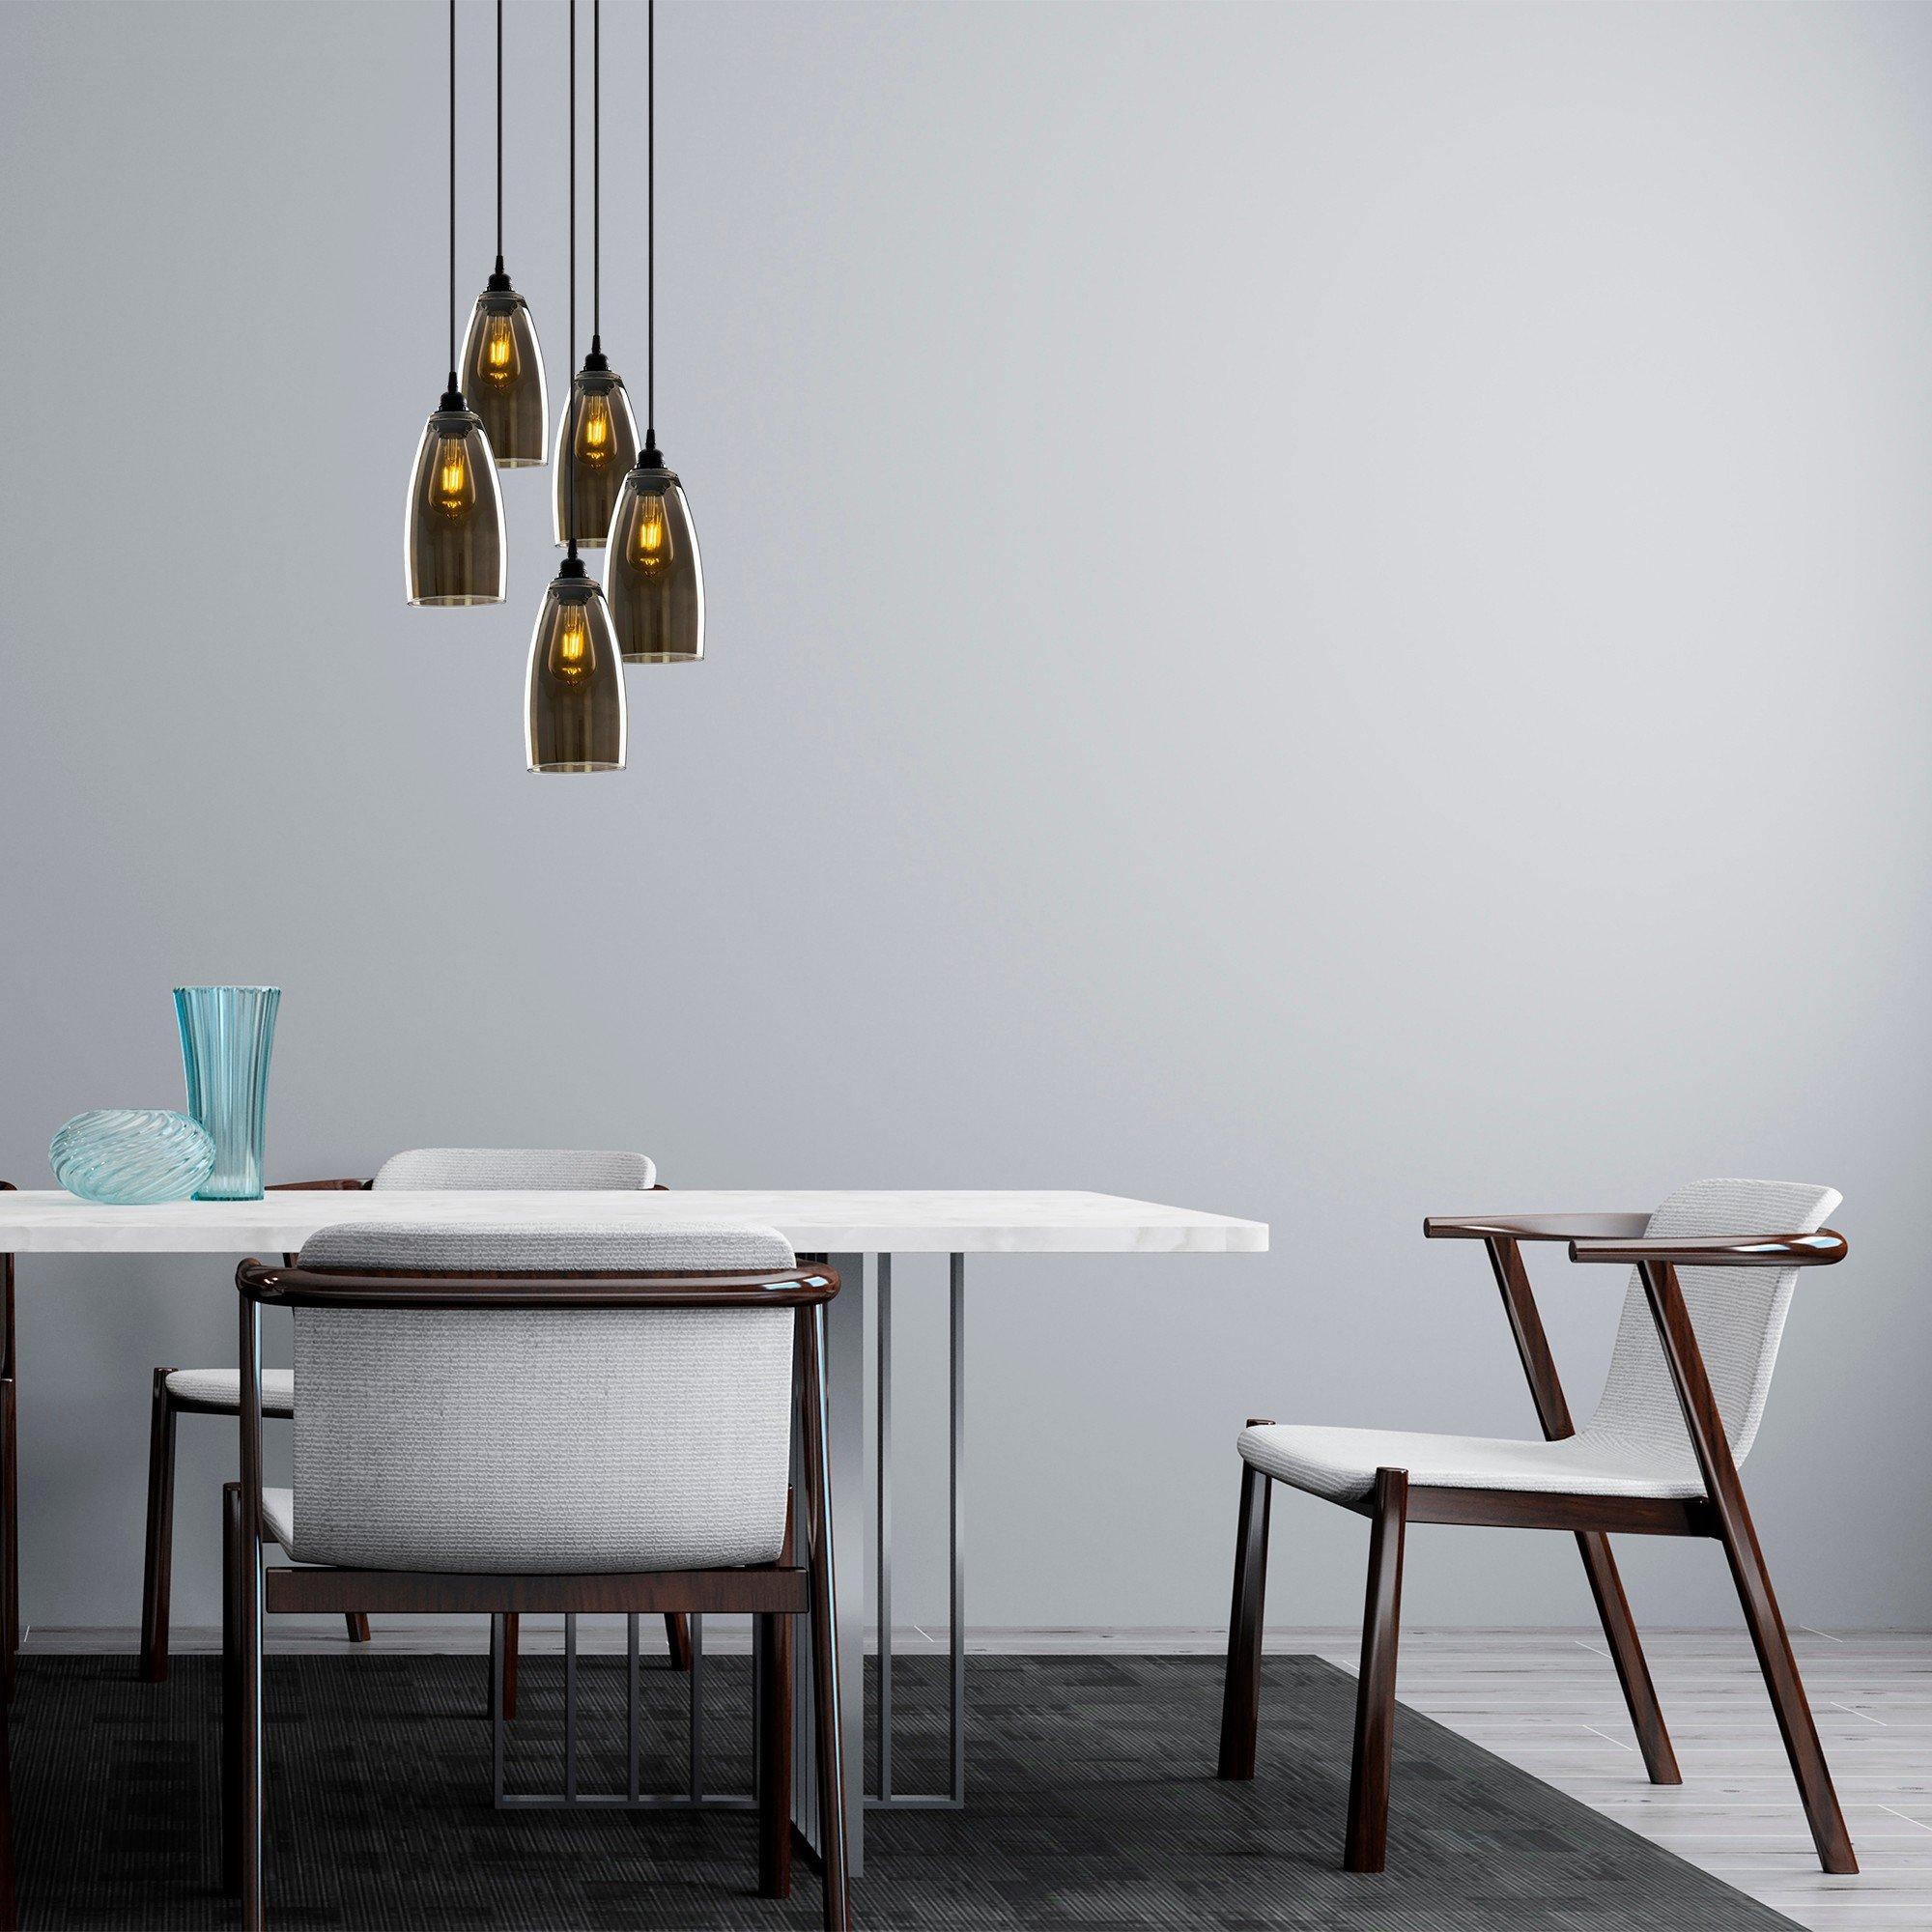 Hanglamp smoked glass donker langwerpig 5 keer een E27 fitting - inrichting